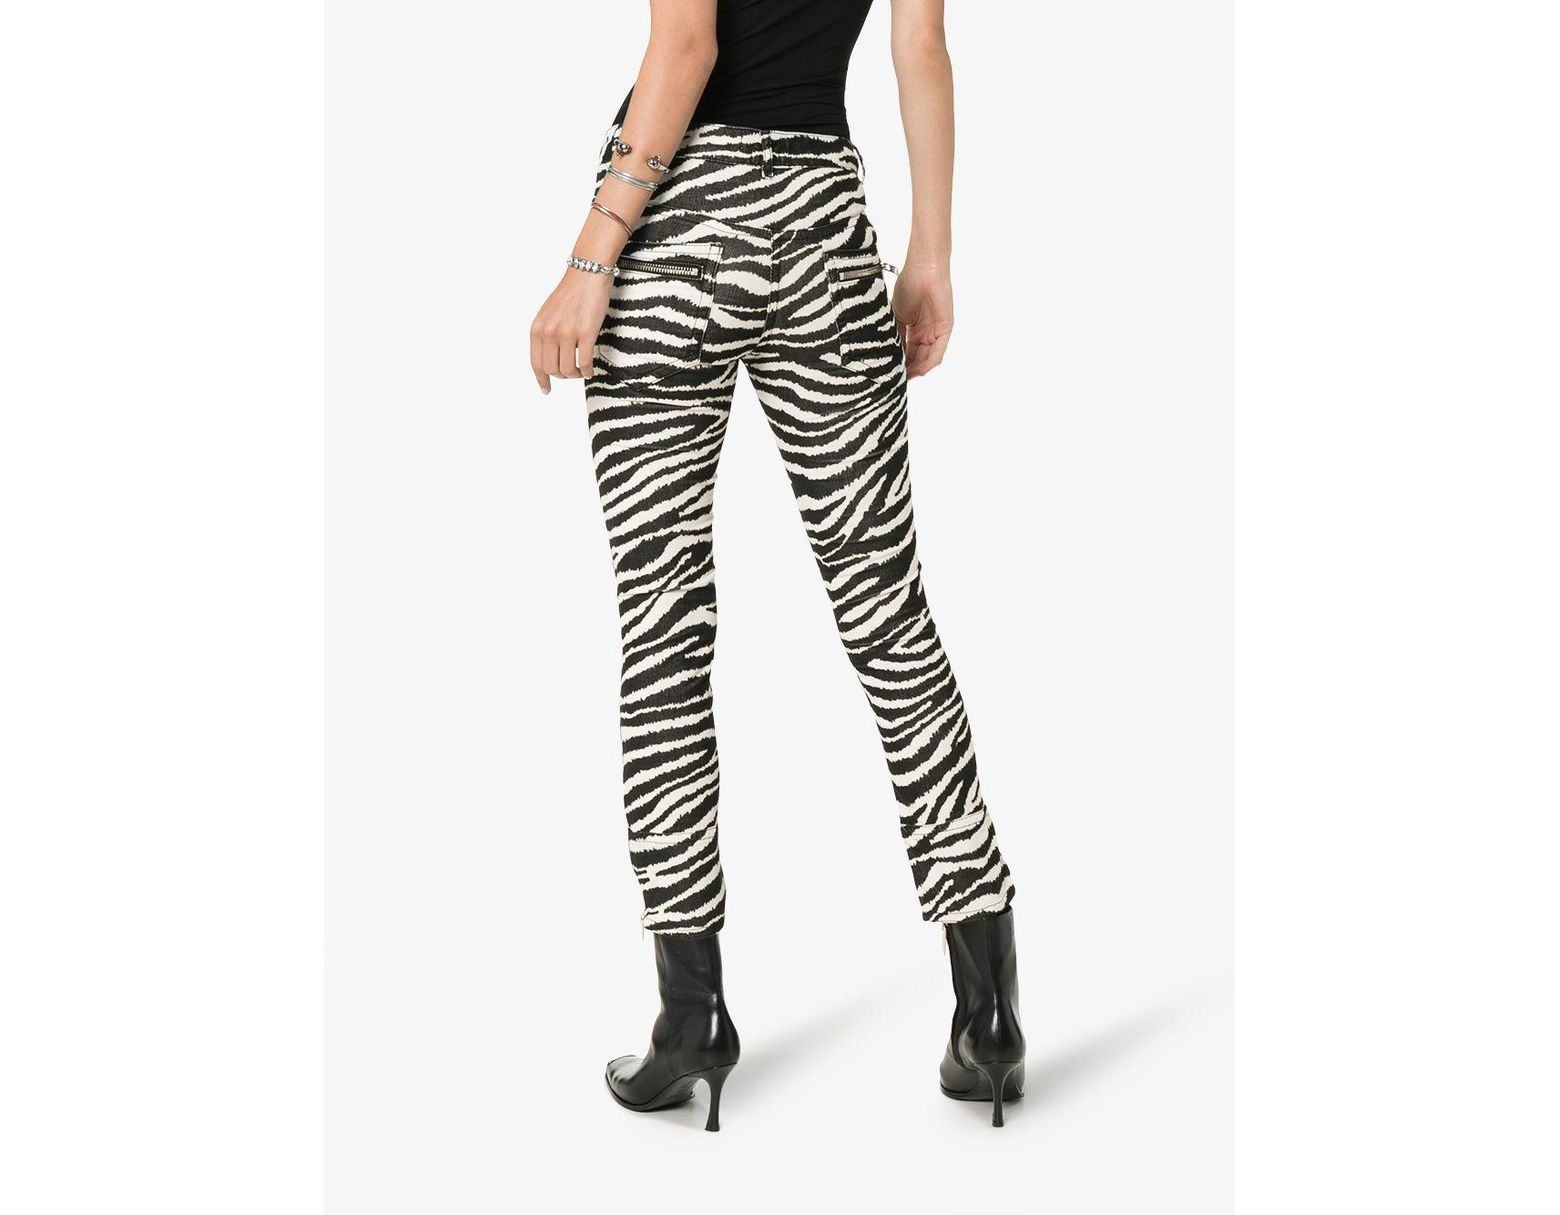 6dfc46e75c2a Étoile Isabel Marant Black And White Alone Zebra Print Cotton Trousers in  Black - Save 72% - Lyst